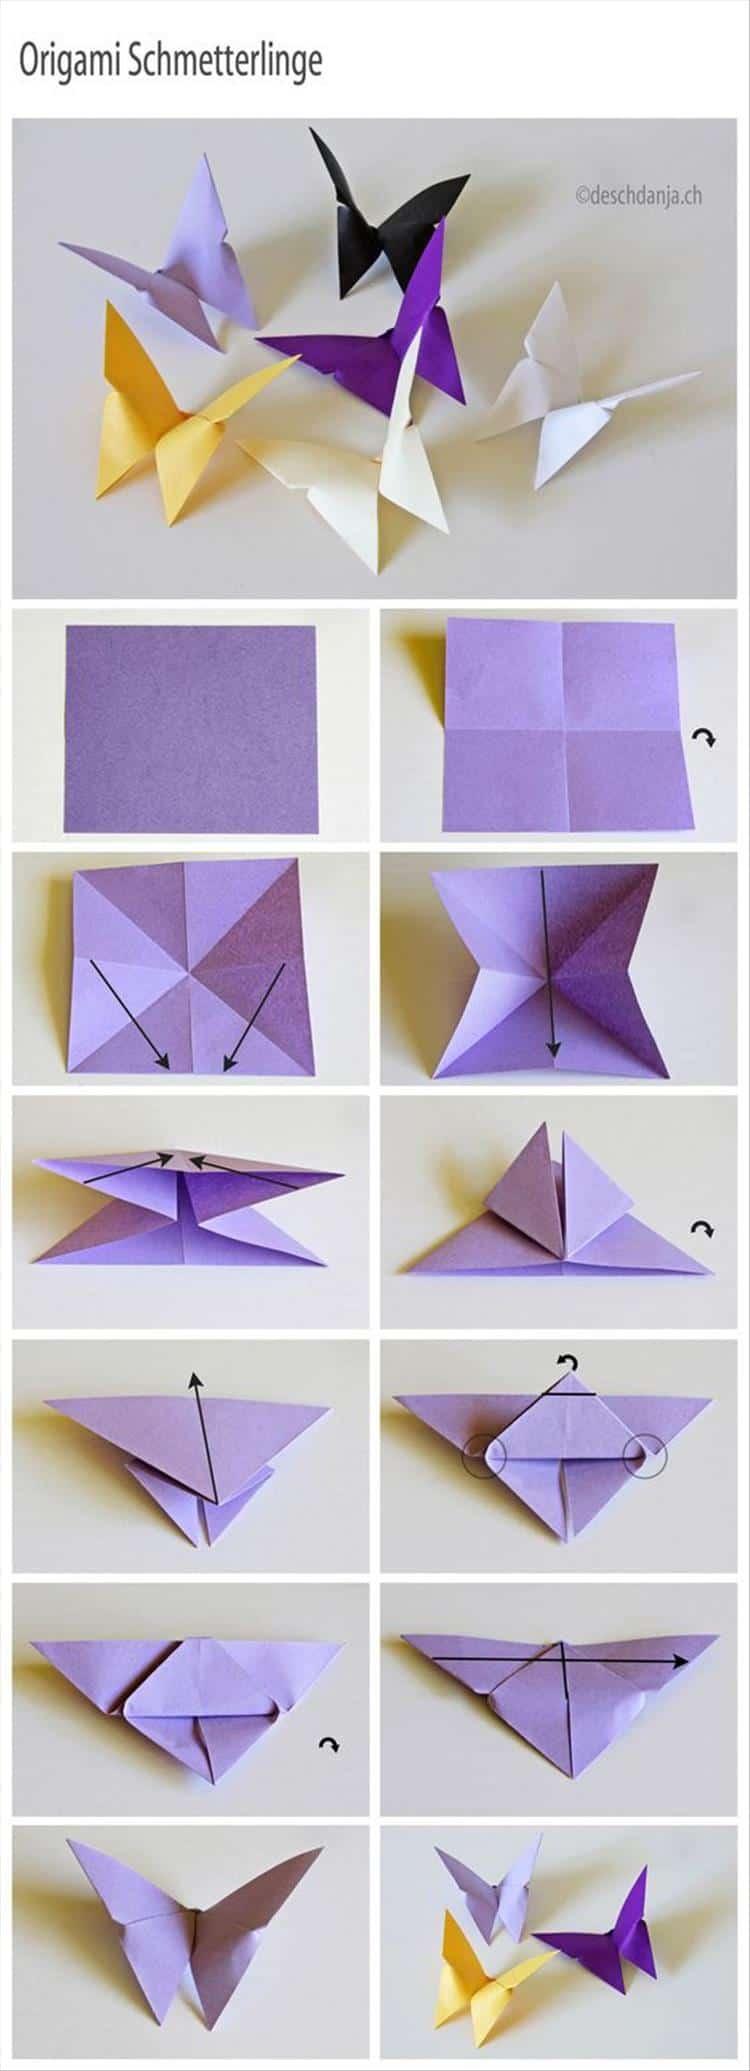 Origami butterglies